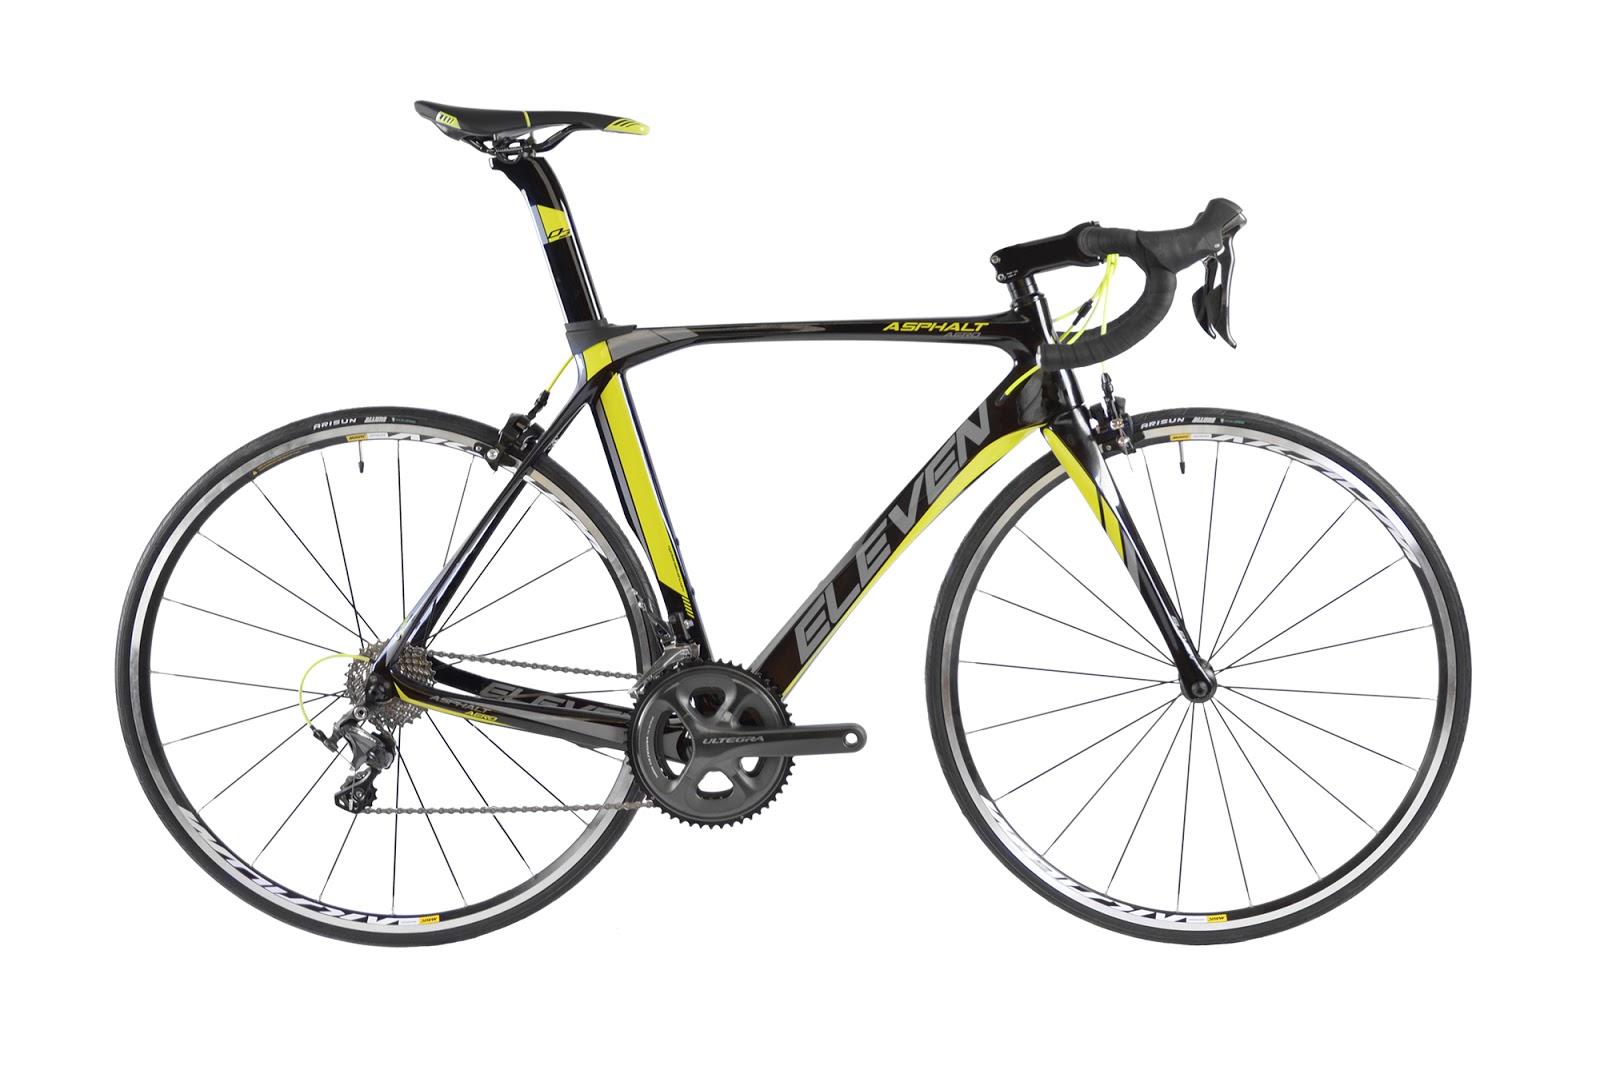 New Asphalt Aero Road Bike From Cycles Eleven